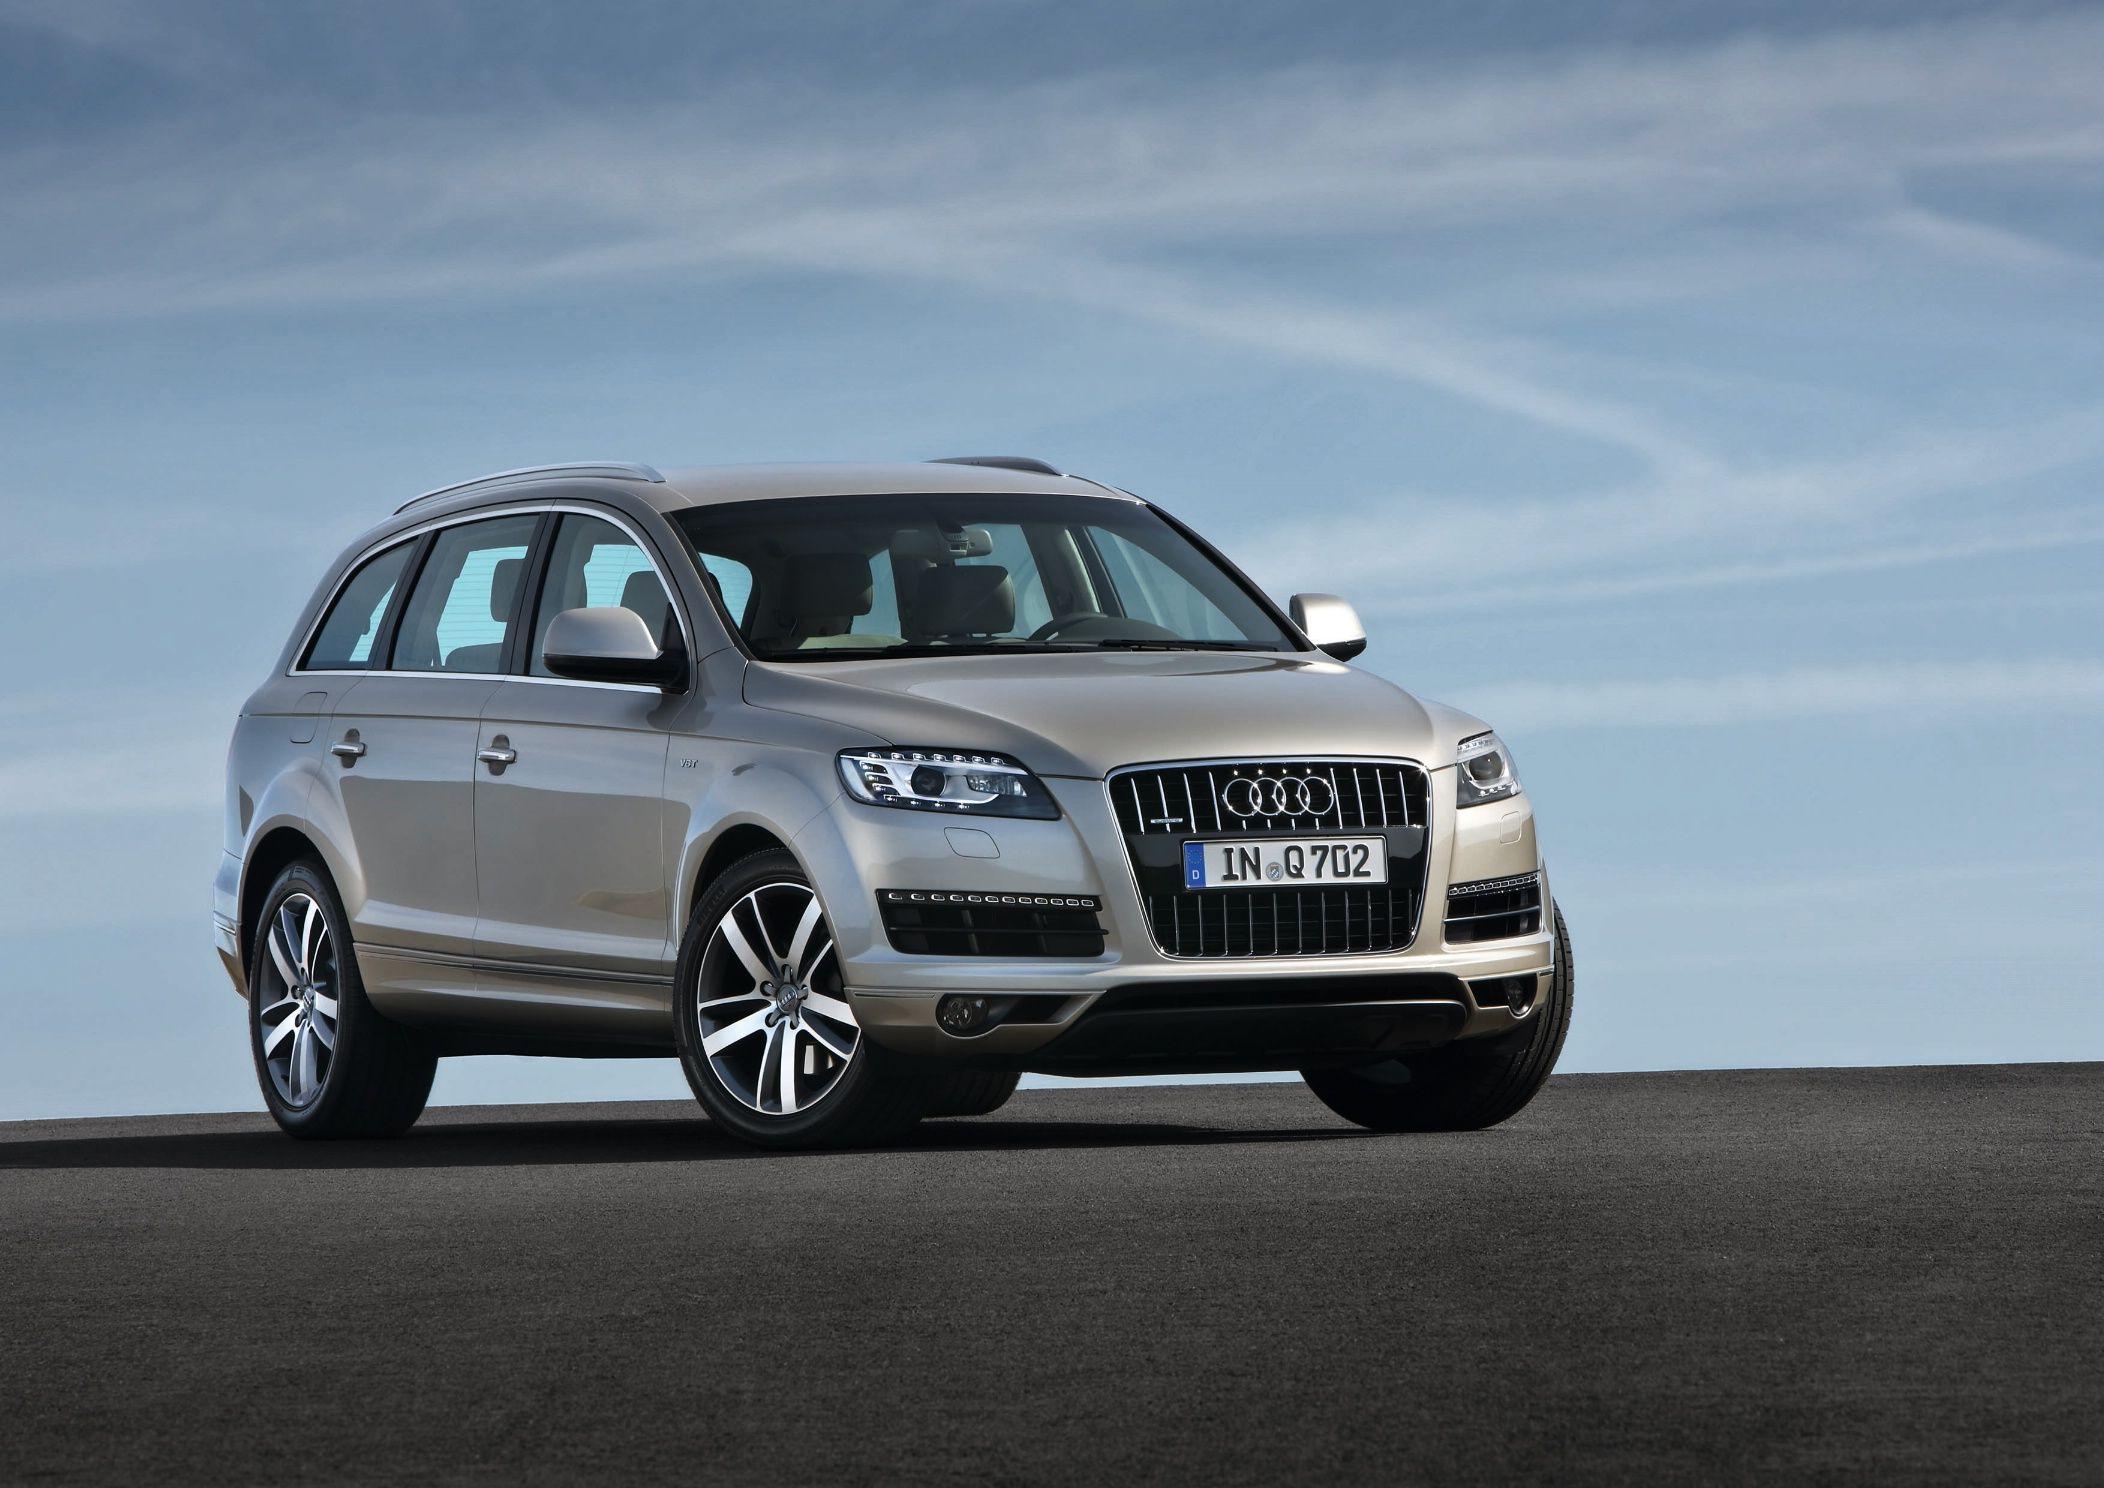 Audi Q7 Model Year 2011: disponibile anche 3.0 TDI clean diesel Euro 6